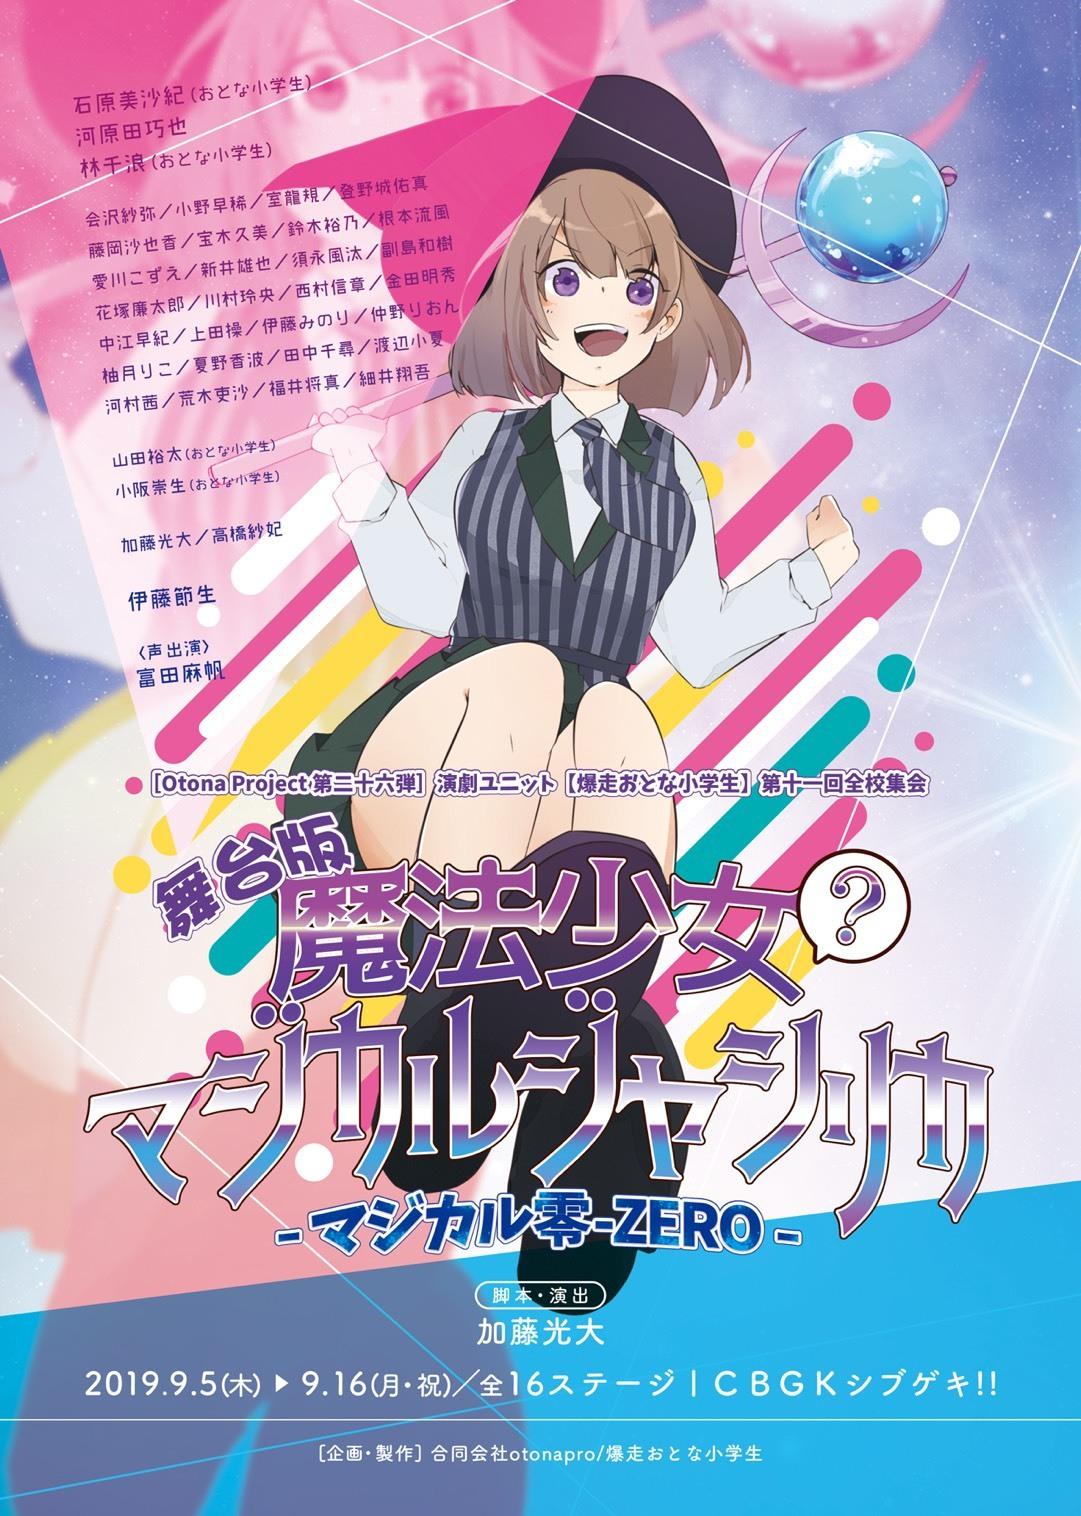 【DVD】『舞台版「魔法少女(?)マジカルジャシリカ-マジカル零-ZERO-」』